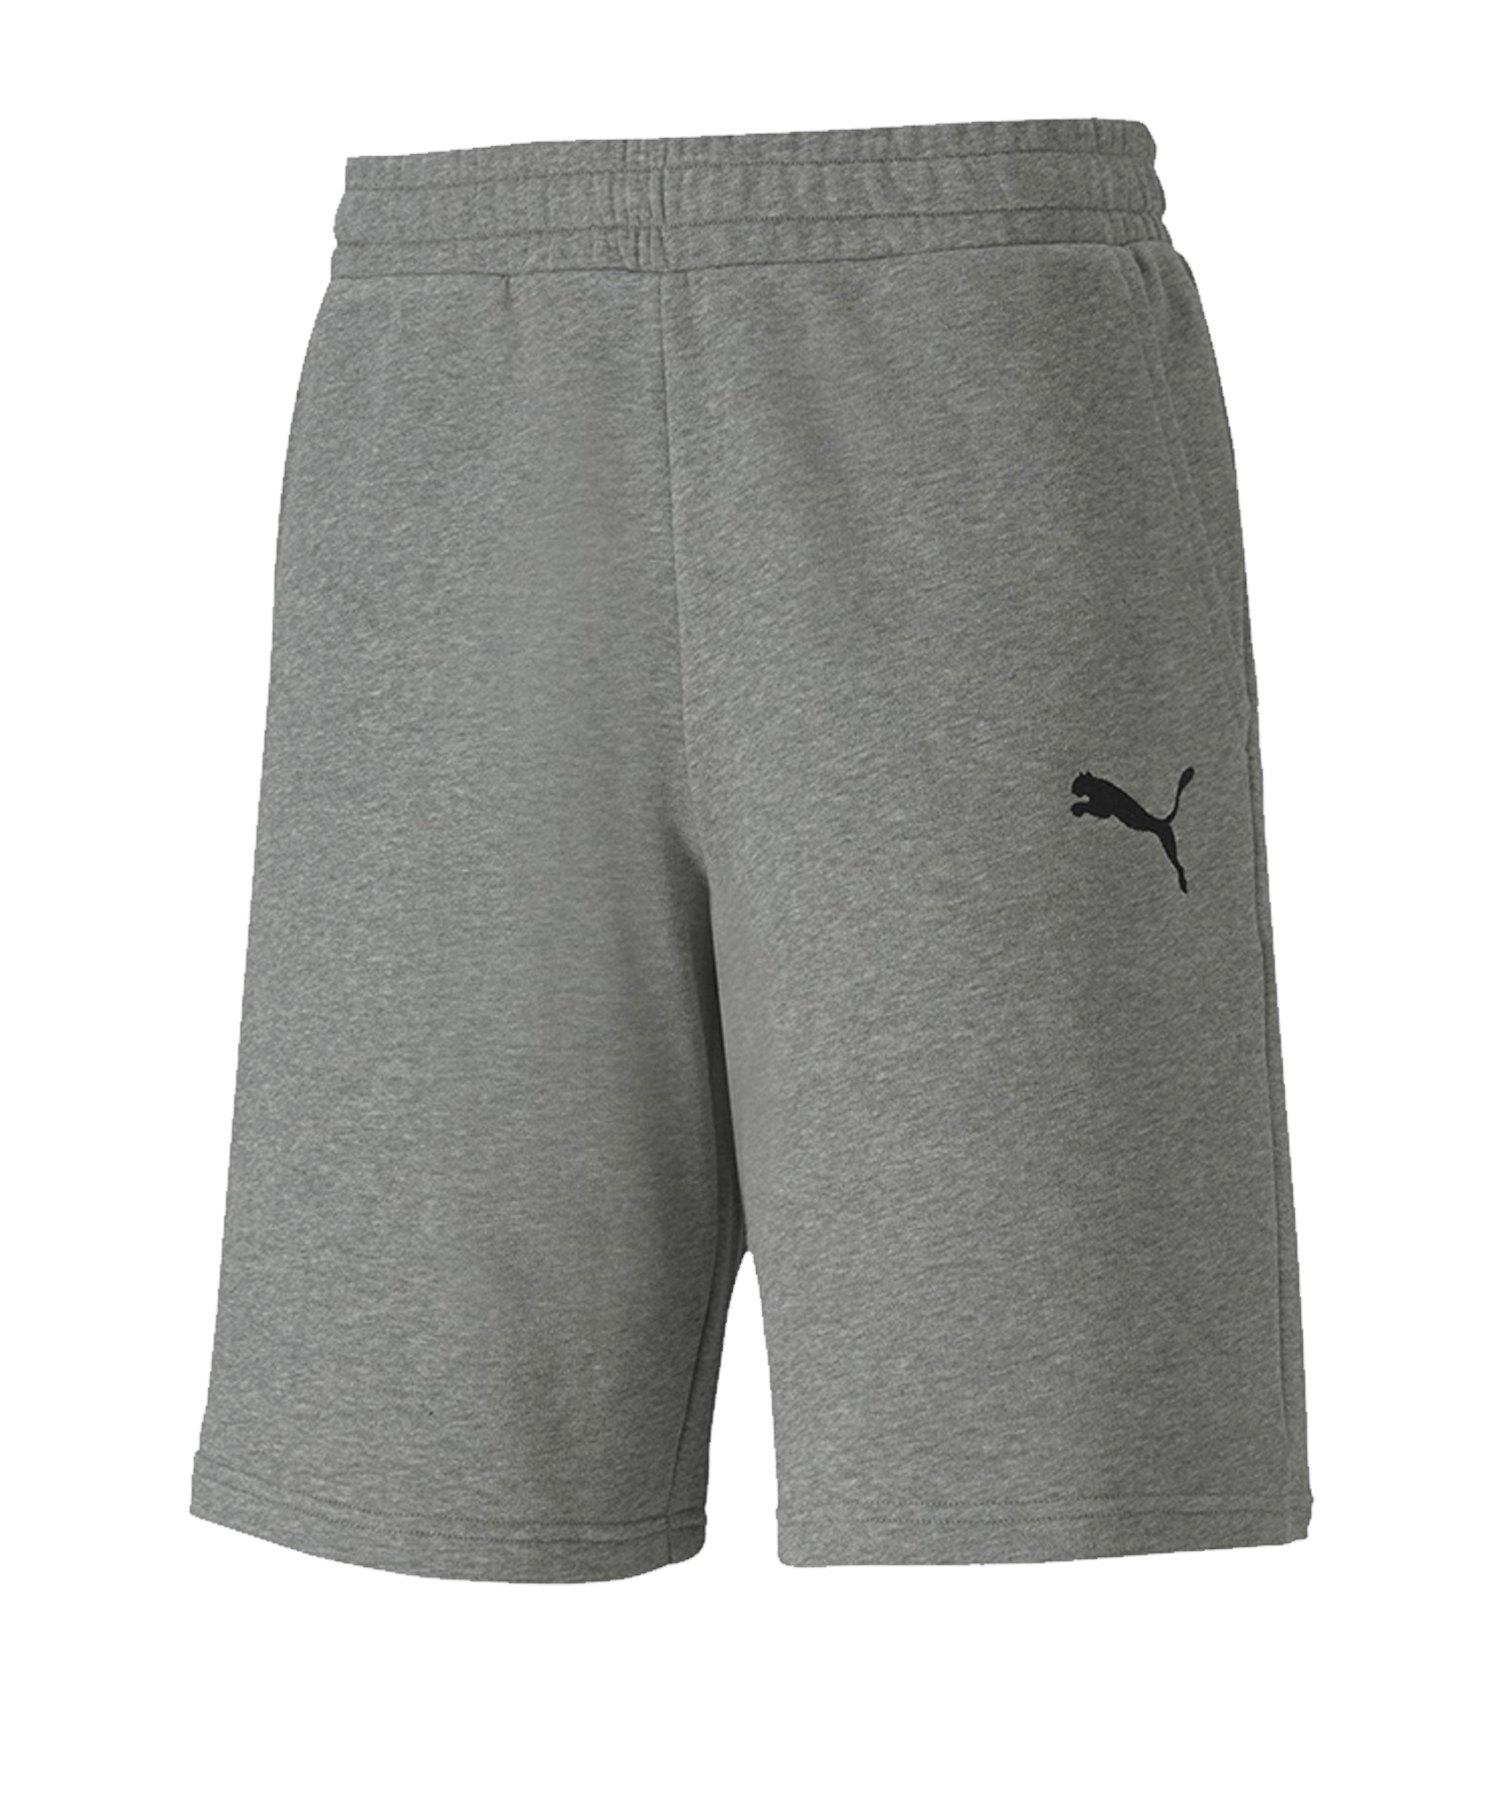 PUMA teamGOAL 23 Casuals Shorts Grau F33 - grau